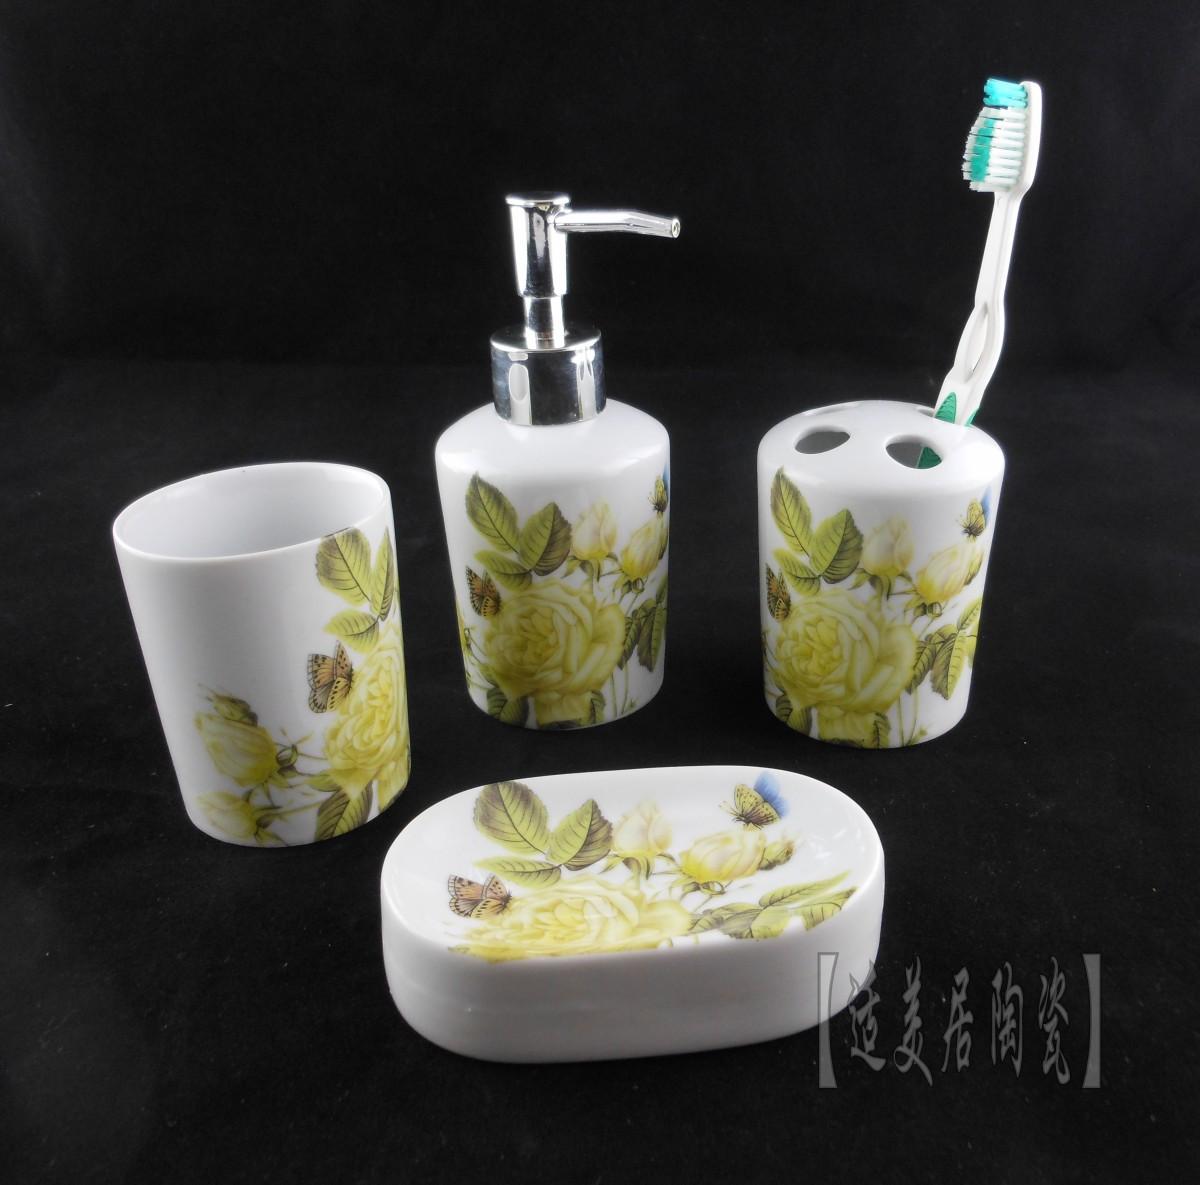 Fashion bathroom at home ceramic supplies Light yellow rose pattern bathroom set bathroom supplies(China (Mainland))